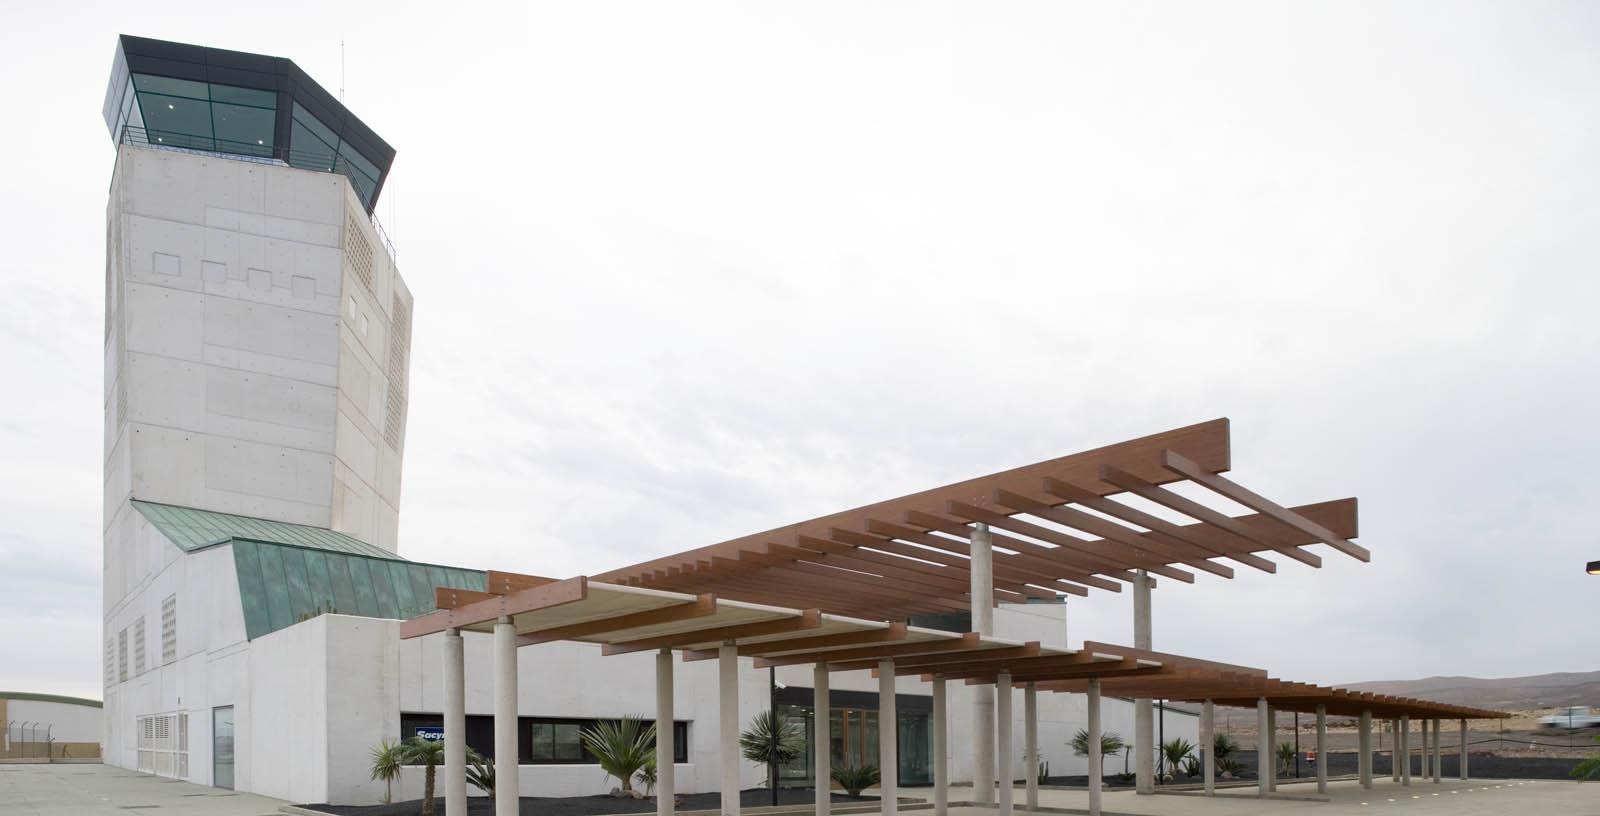 control-tower-fuerteventura-airport-03-Architecture-IDOM-copyright-Miguel_de_Guzman